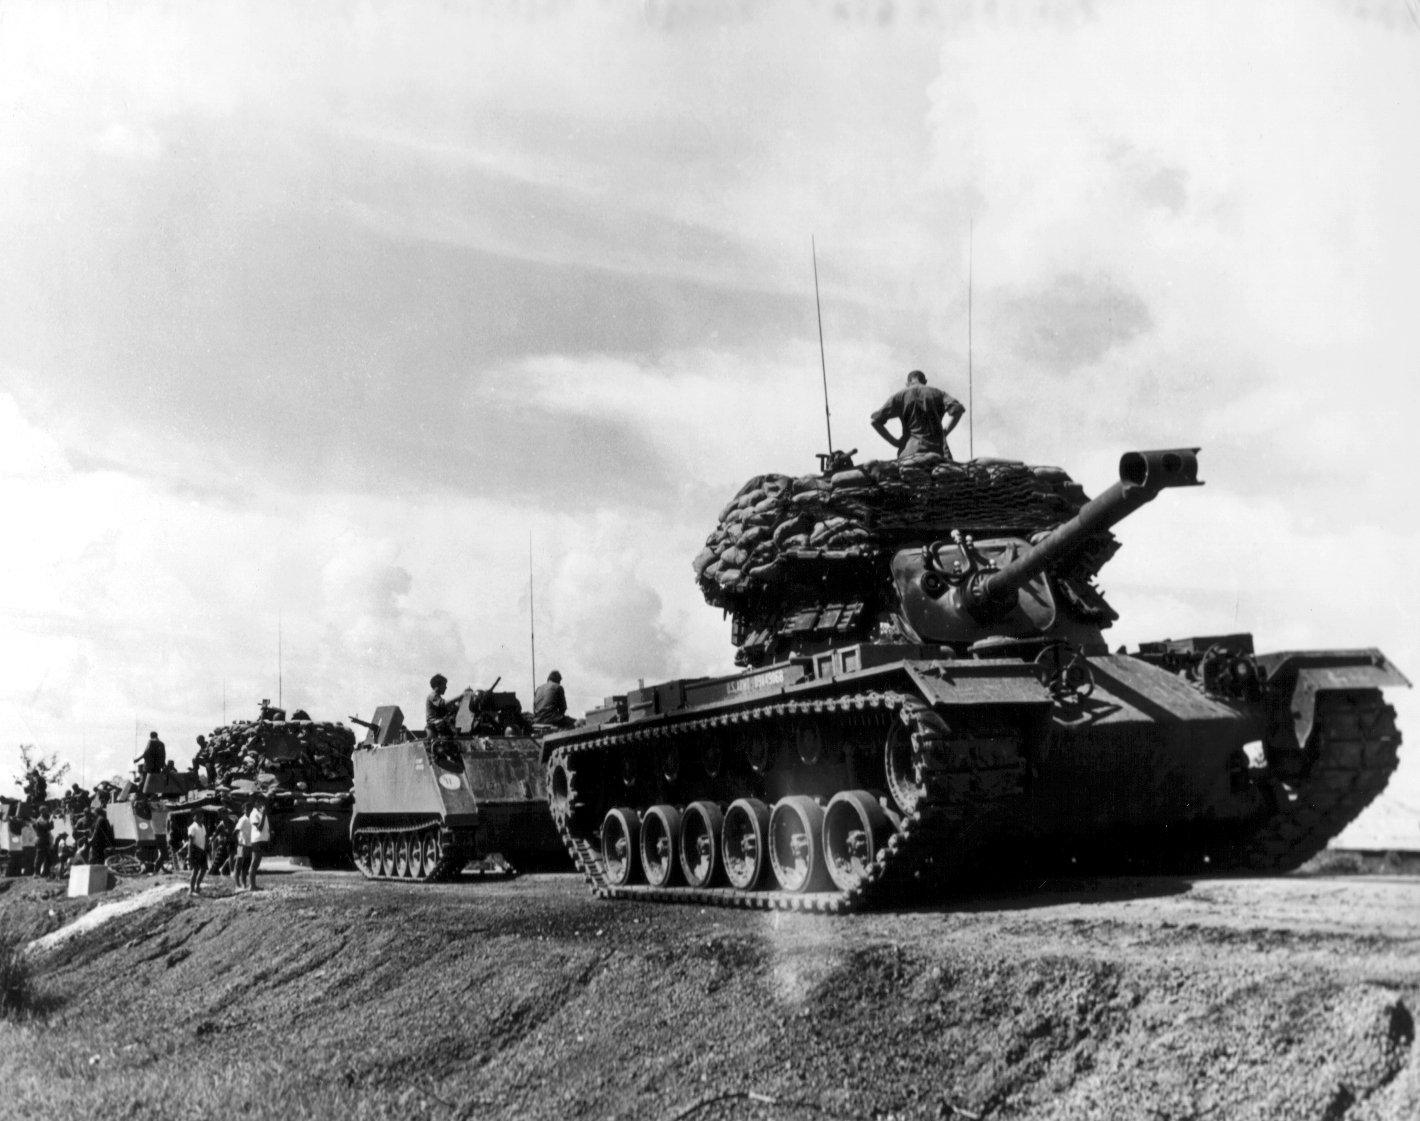 Vietnam War Period: